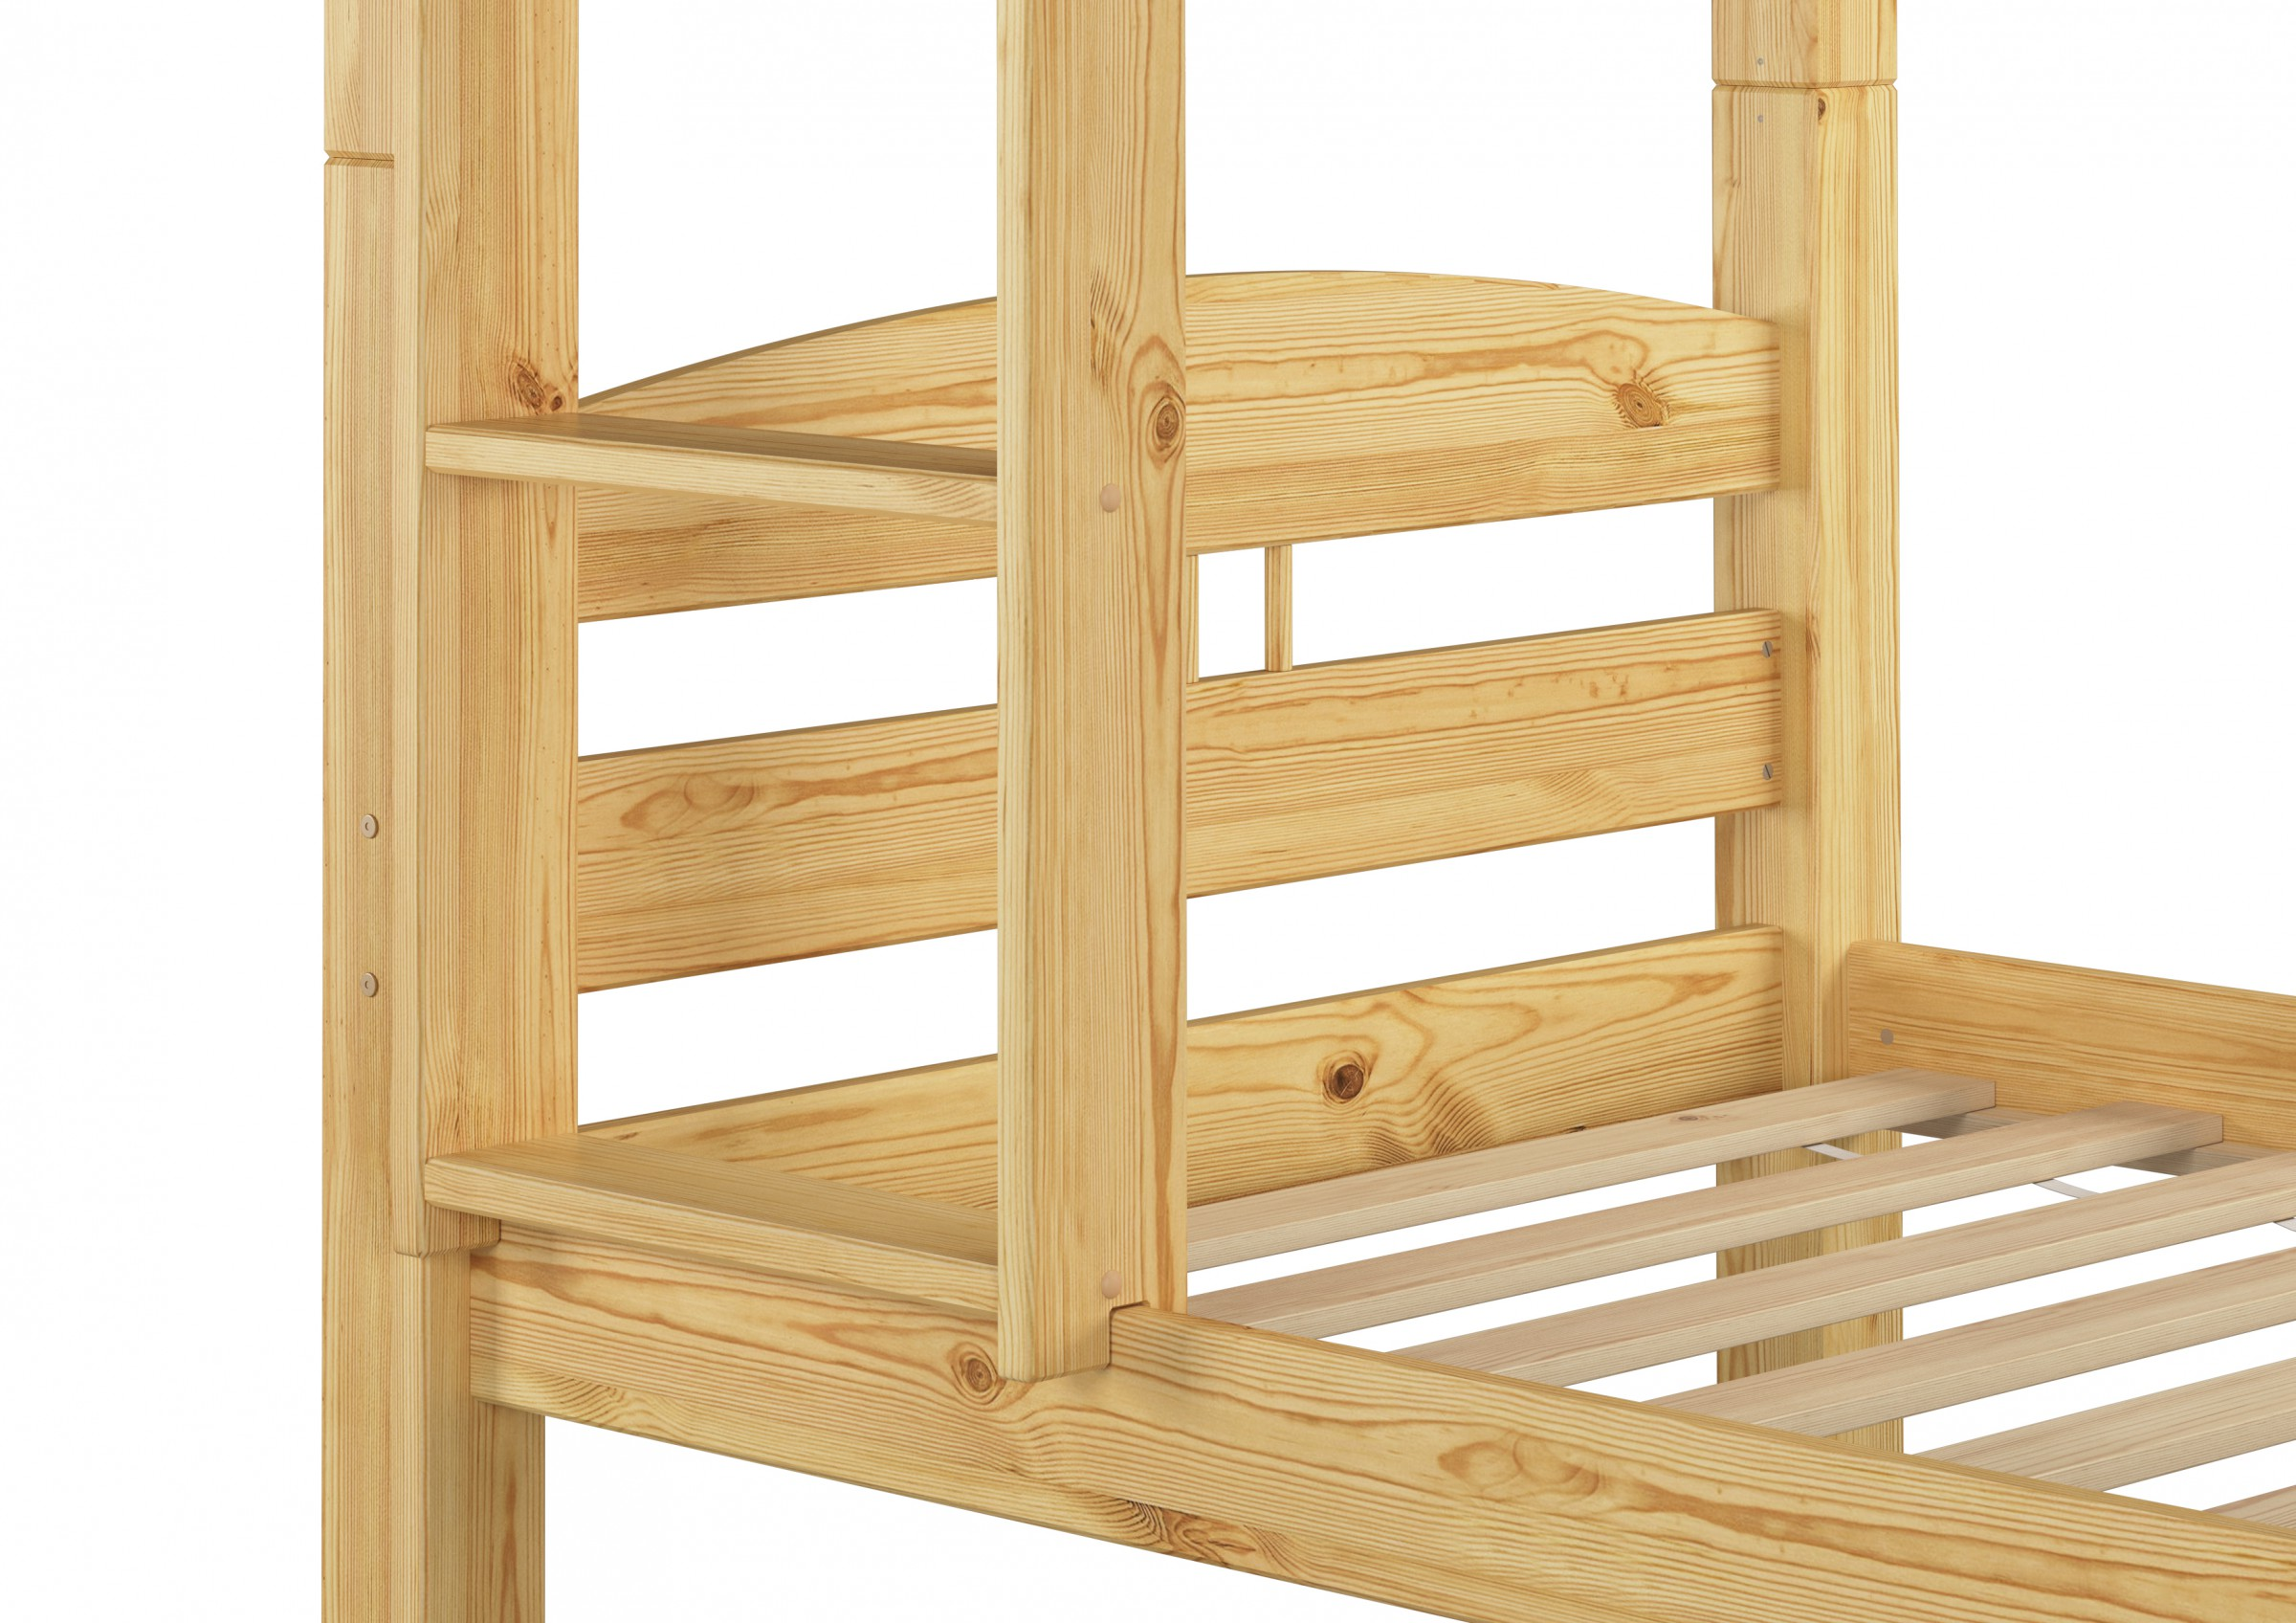 kinderbett etagenbett holzbett stockbett kiefer 90x200 mit. Black Bedroom Furniture Sets. Home Design Ideas